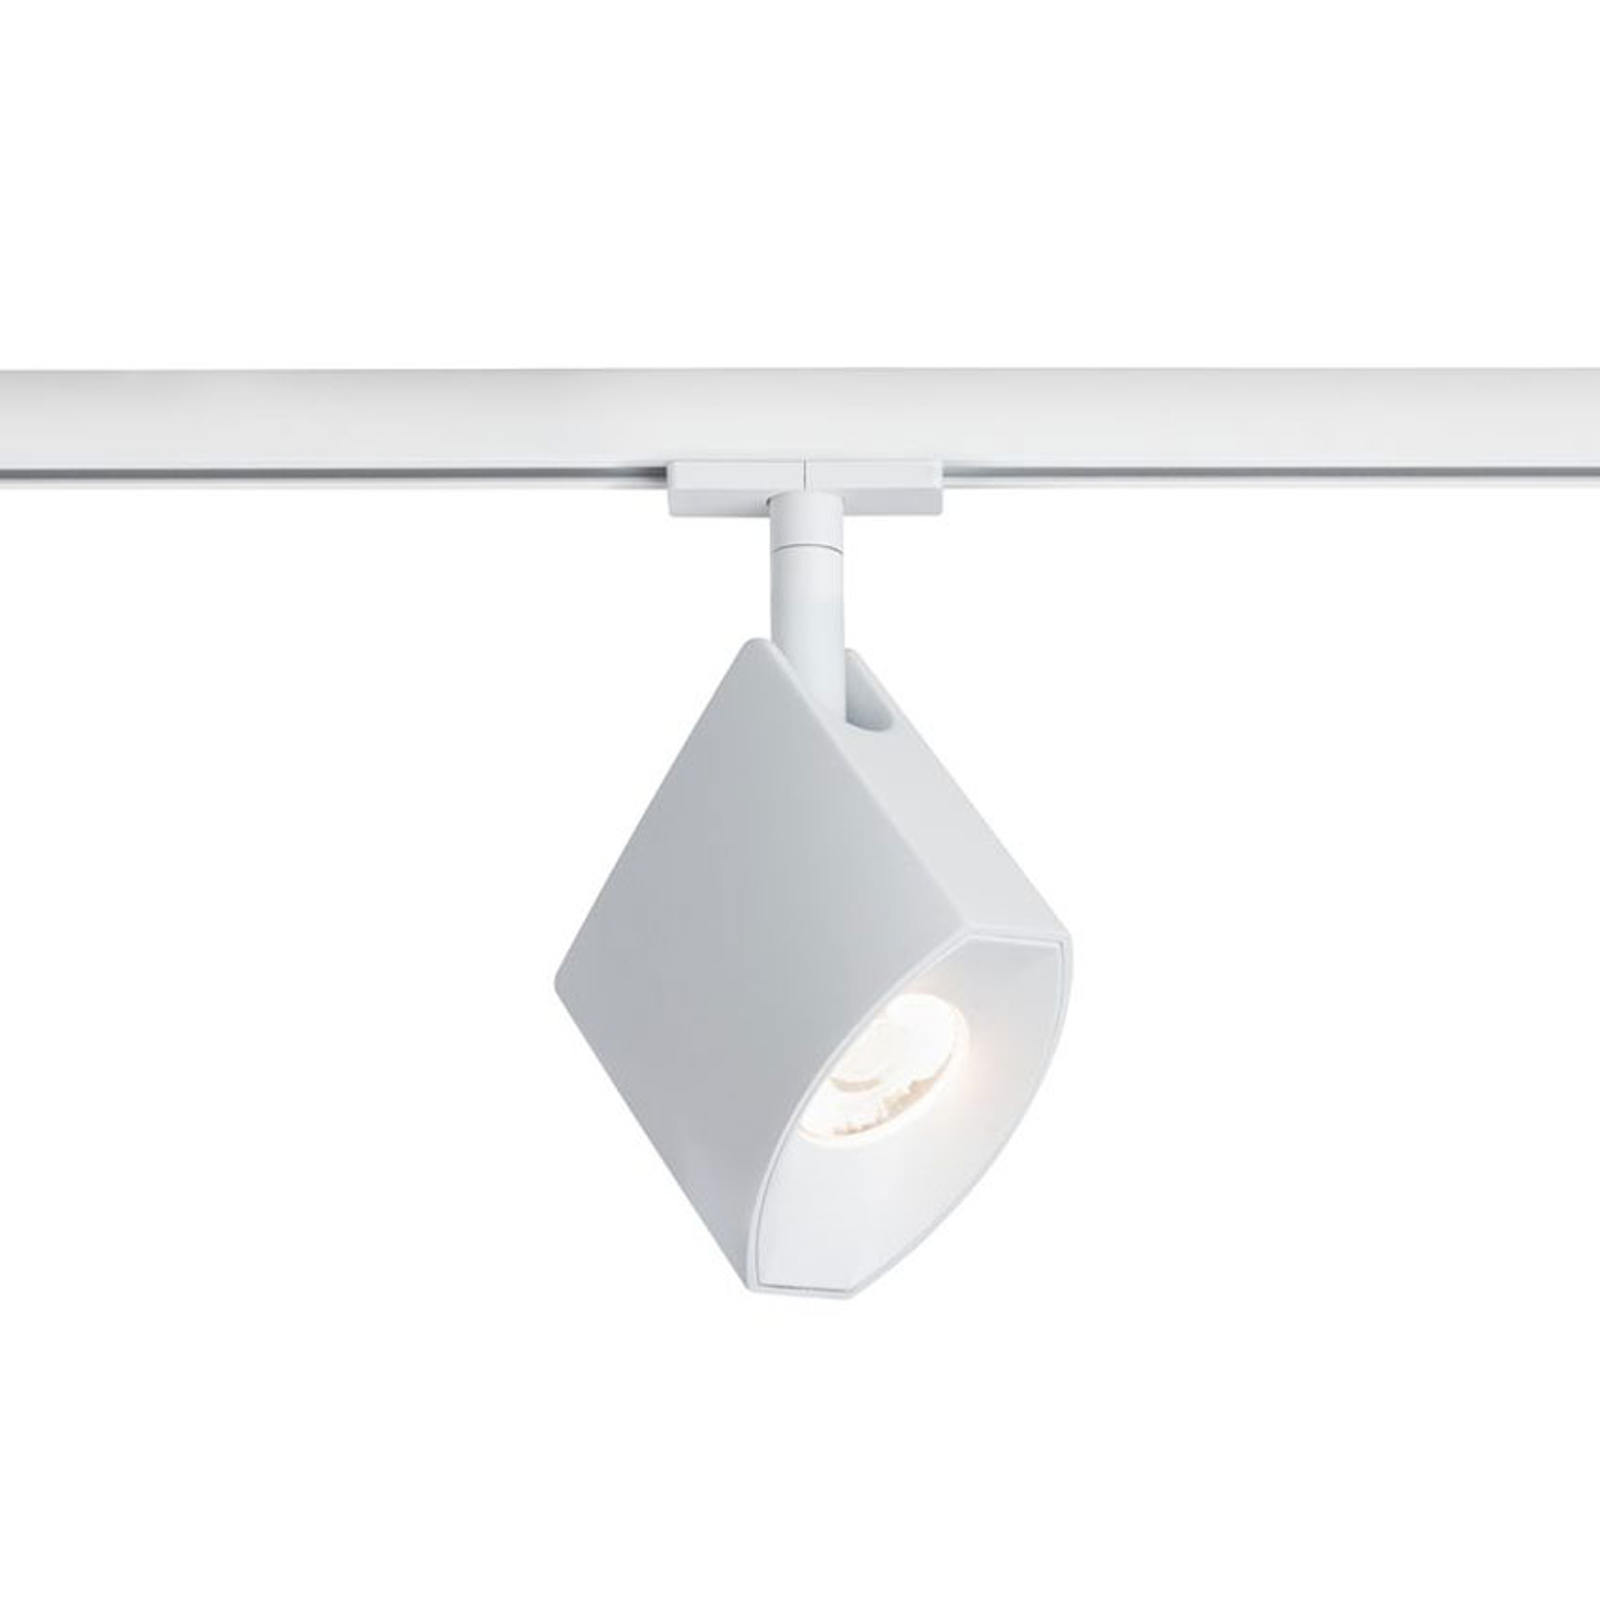 Paulmann NanoRail Stelo LED-Spot, weiß